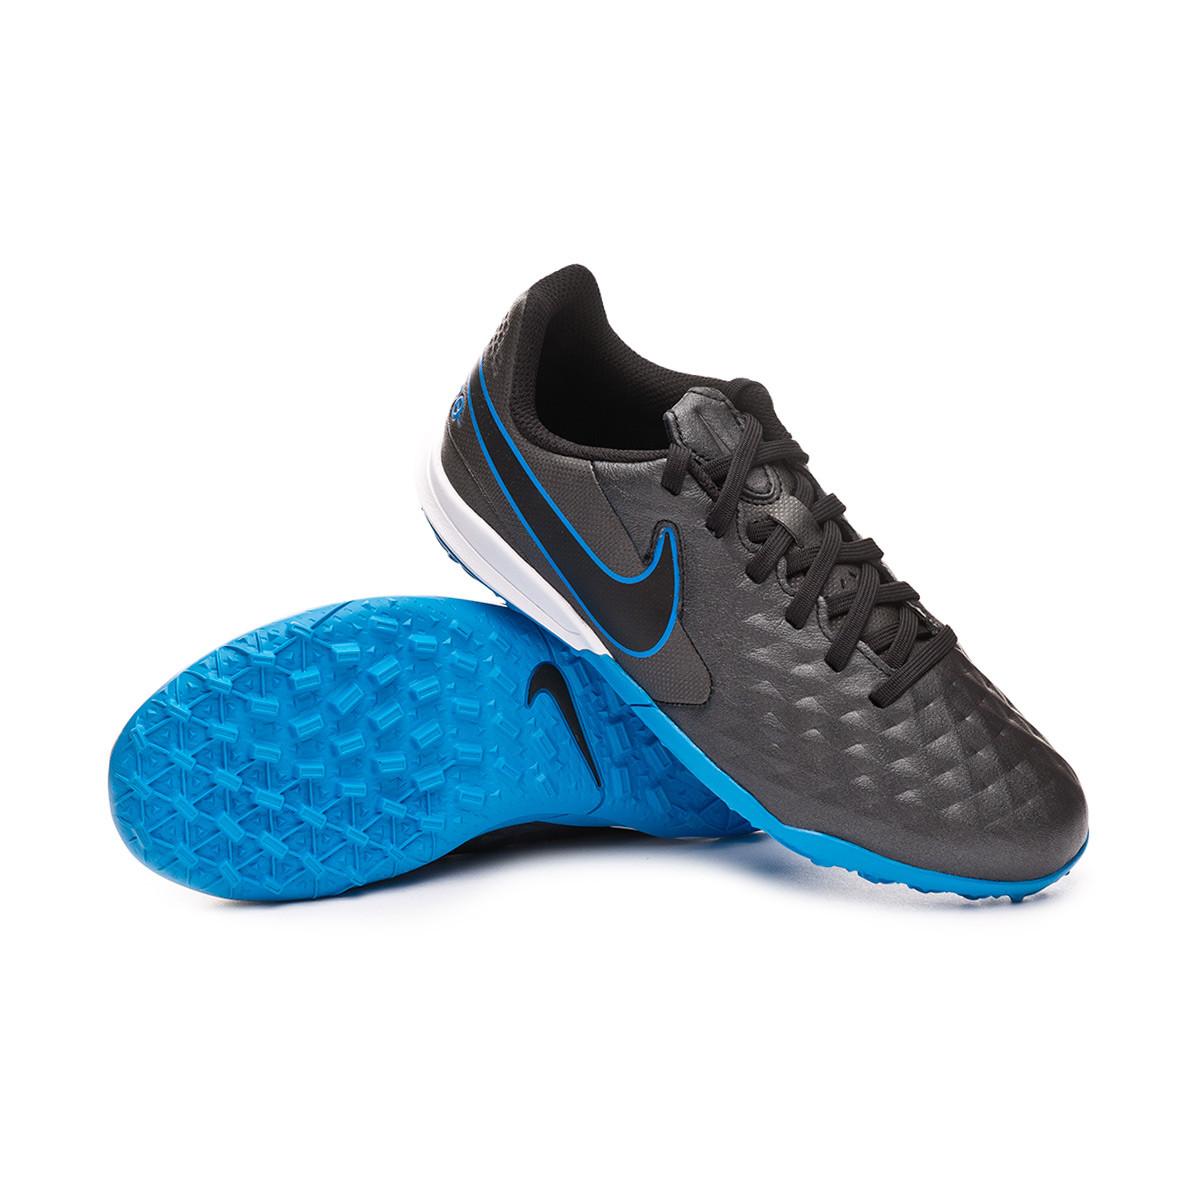 Nike Tiempo Legend VIII Academy Turf Niño Football Boot